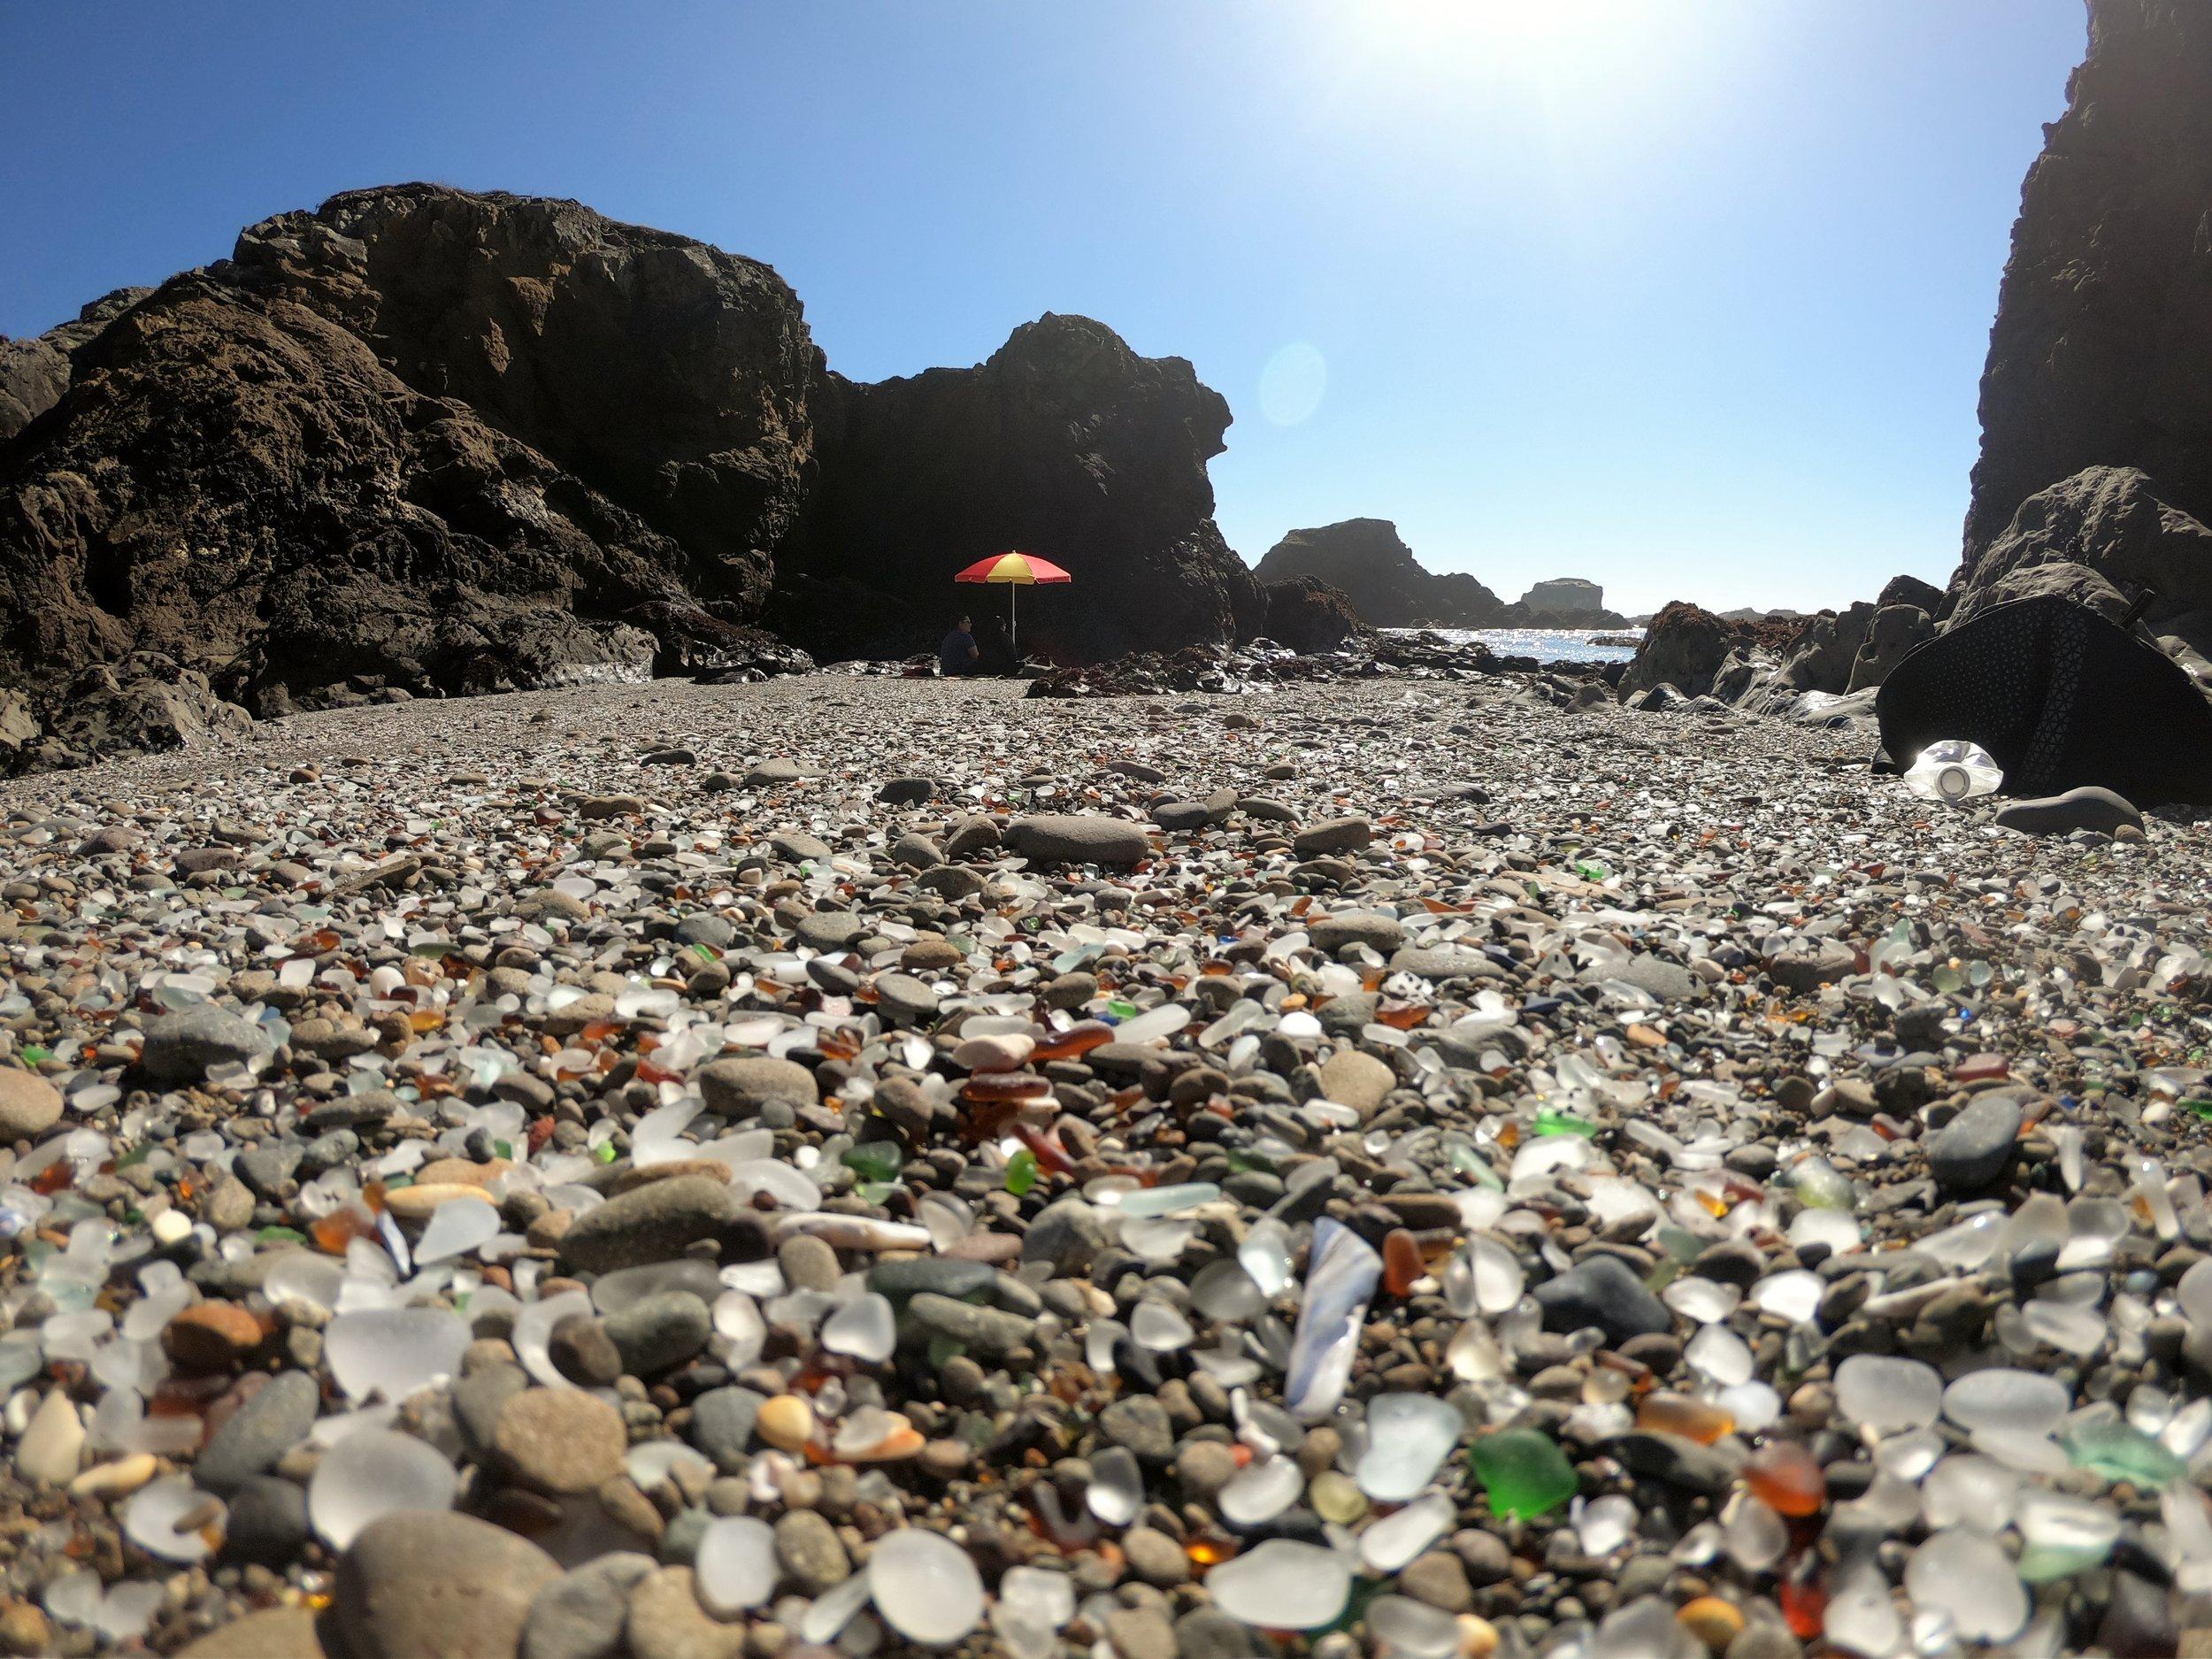 Sea glass at Glass Beach. Photo 3/15/2019